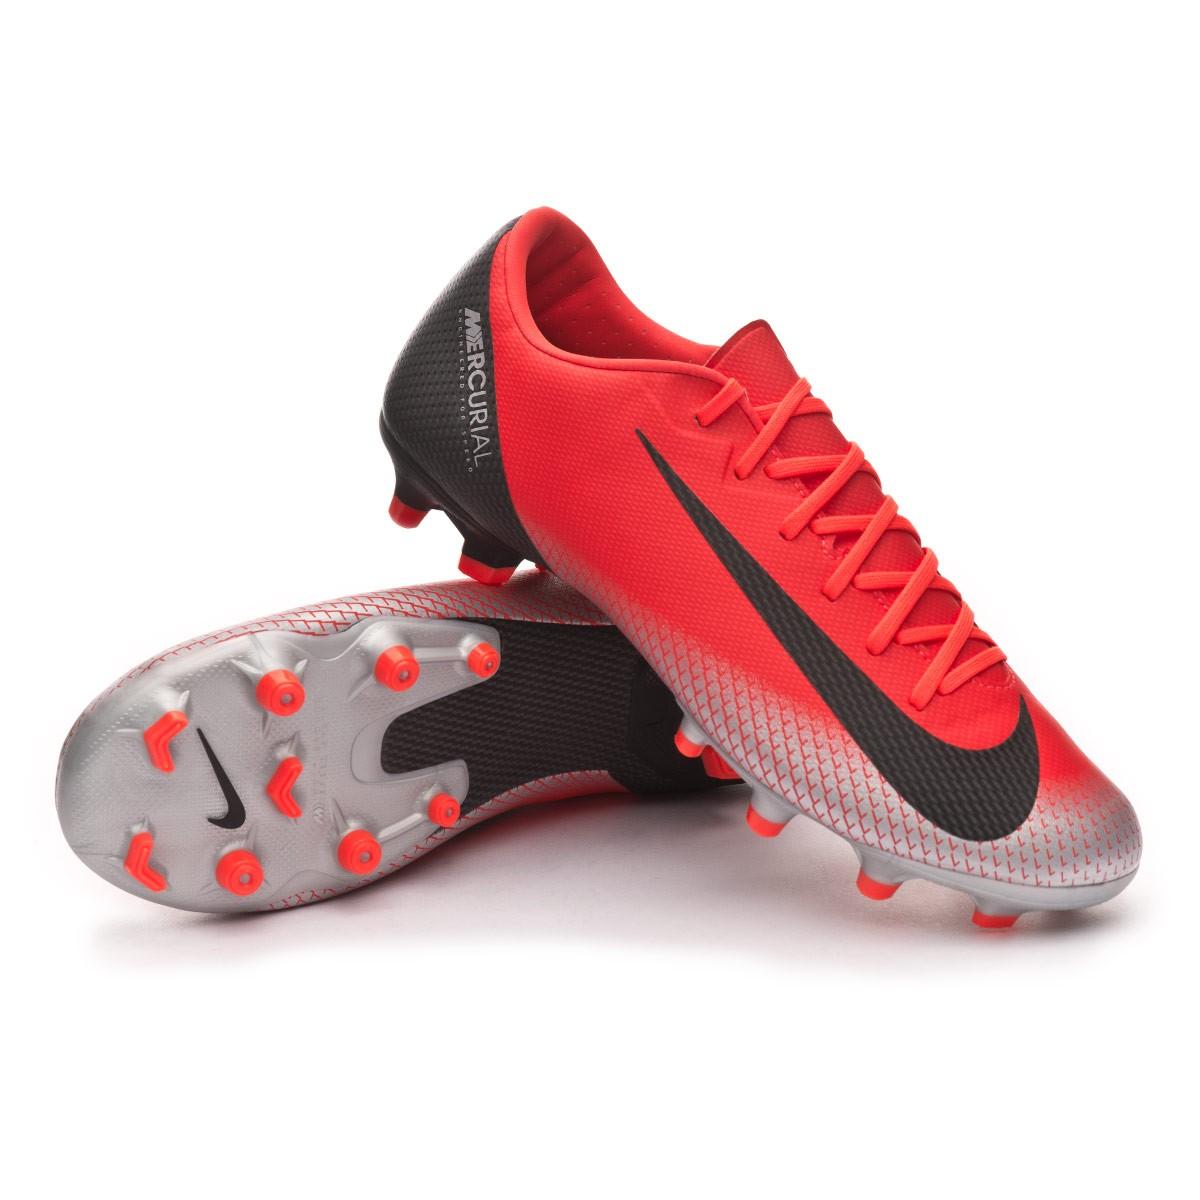 6766dca1a Football Boots Nike Mercurial Vapor XII Academy CR7 MG Bright ...